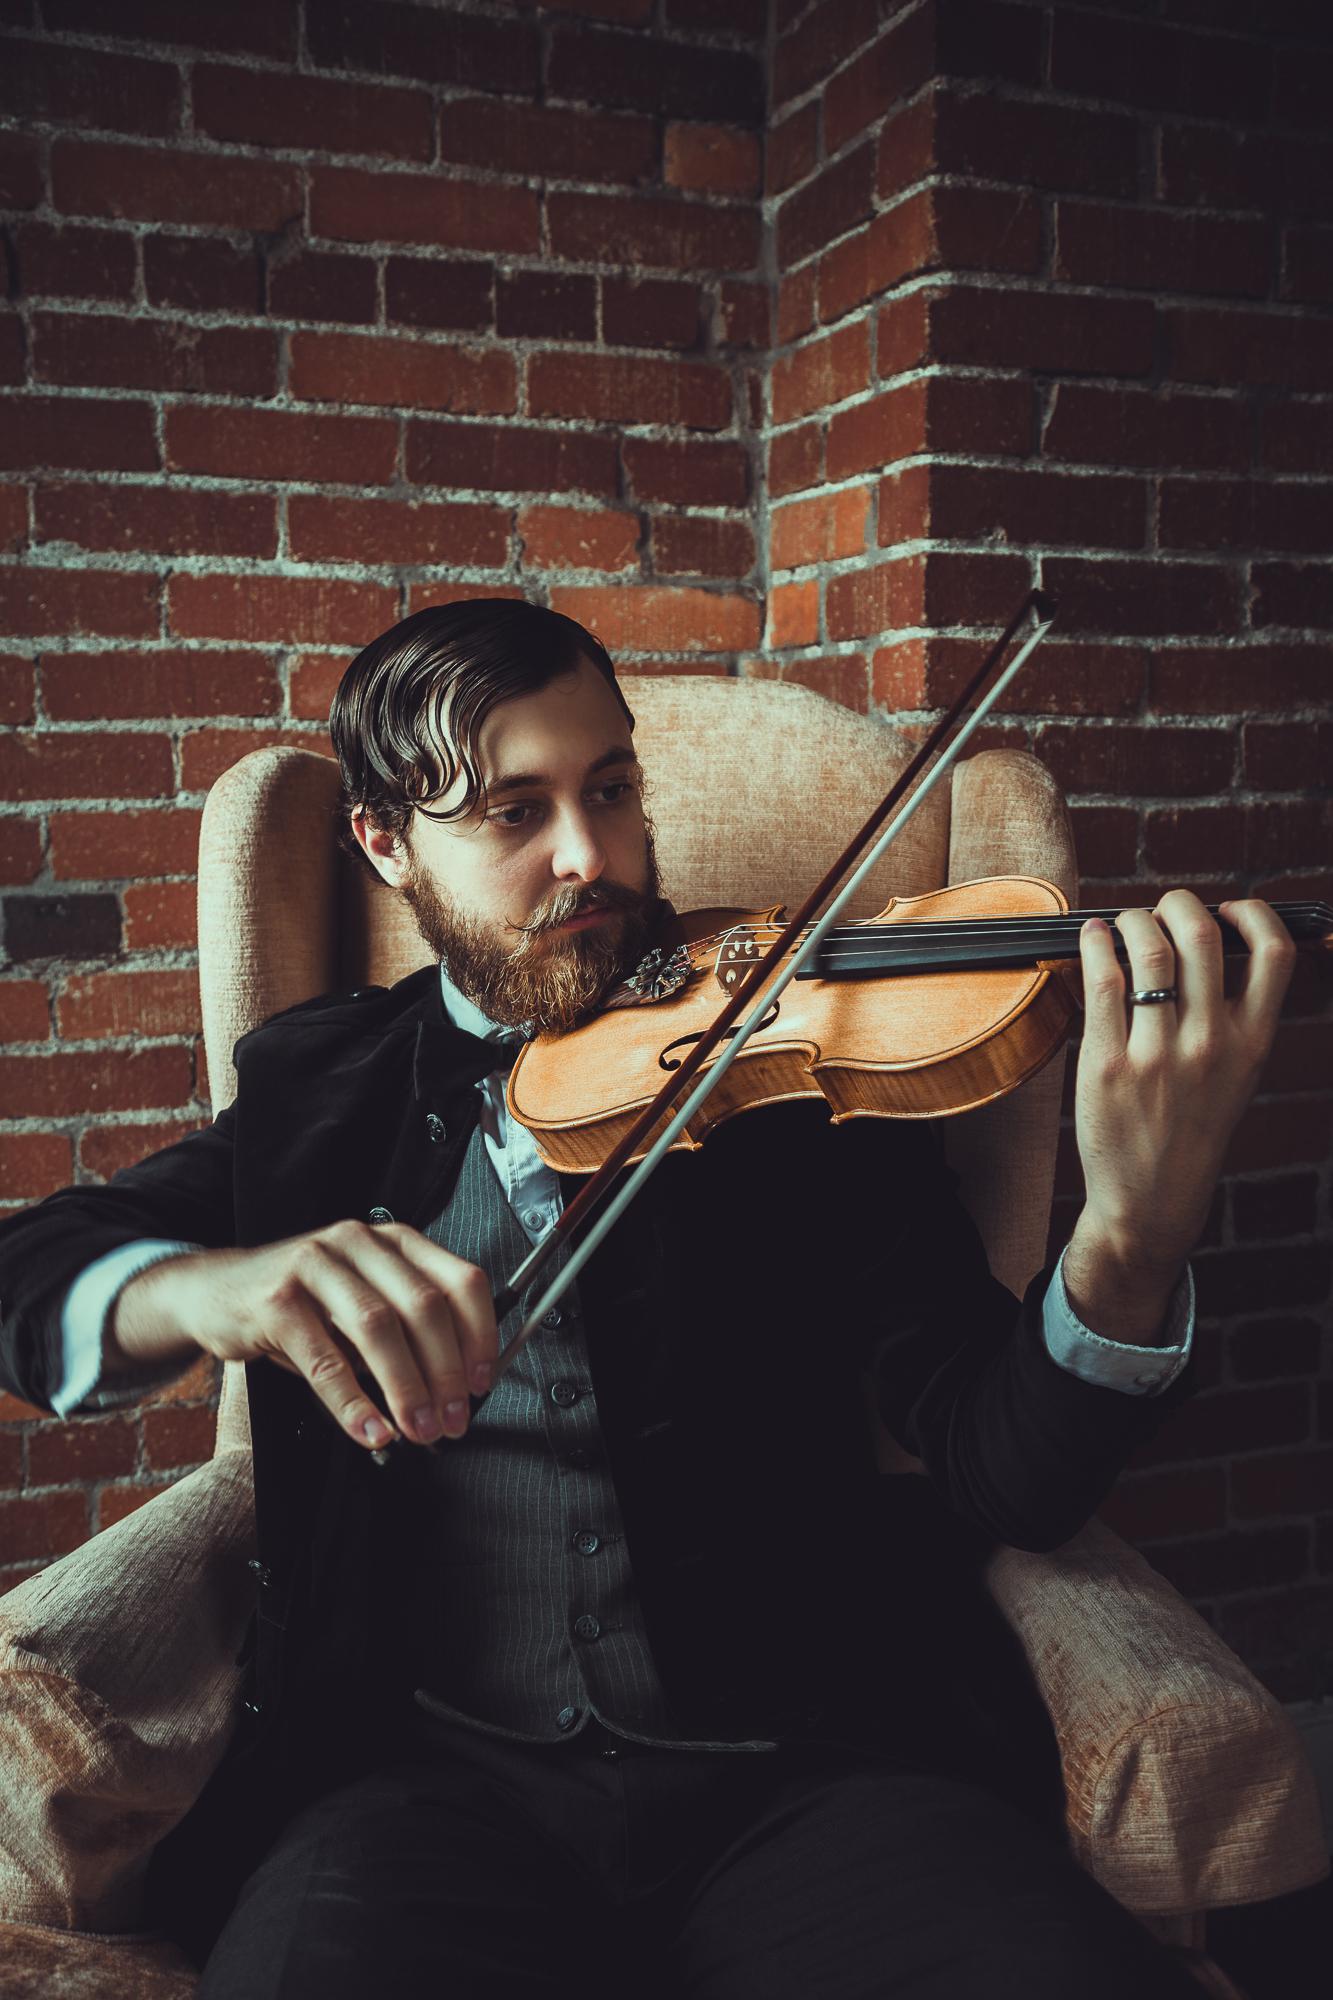 Mr. Snoke & His Violin